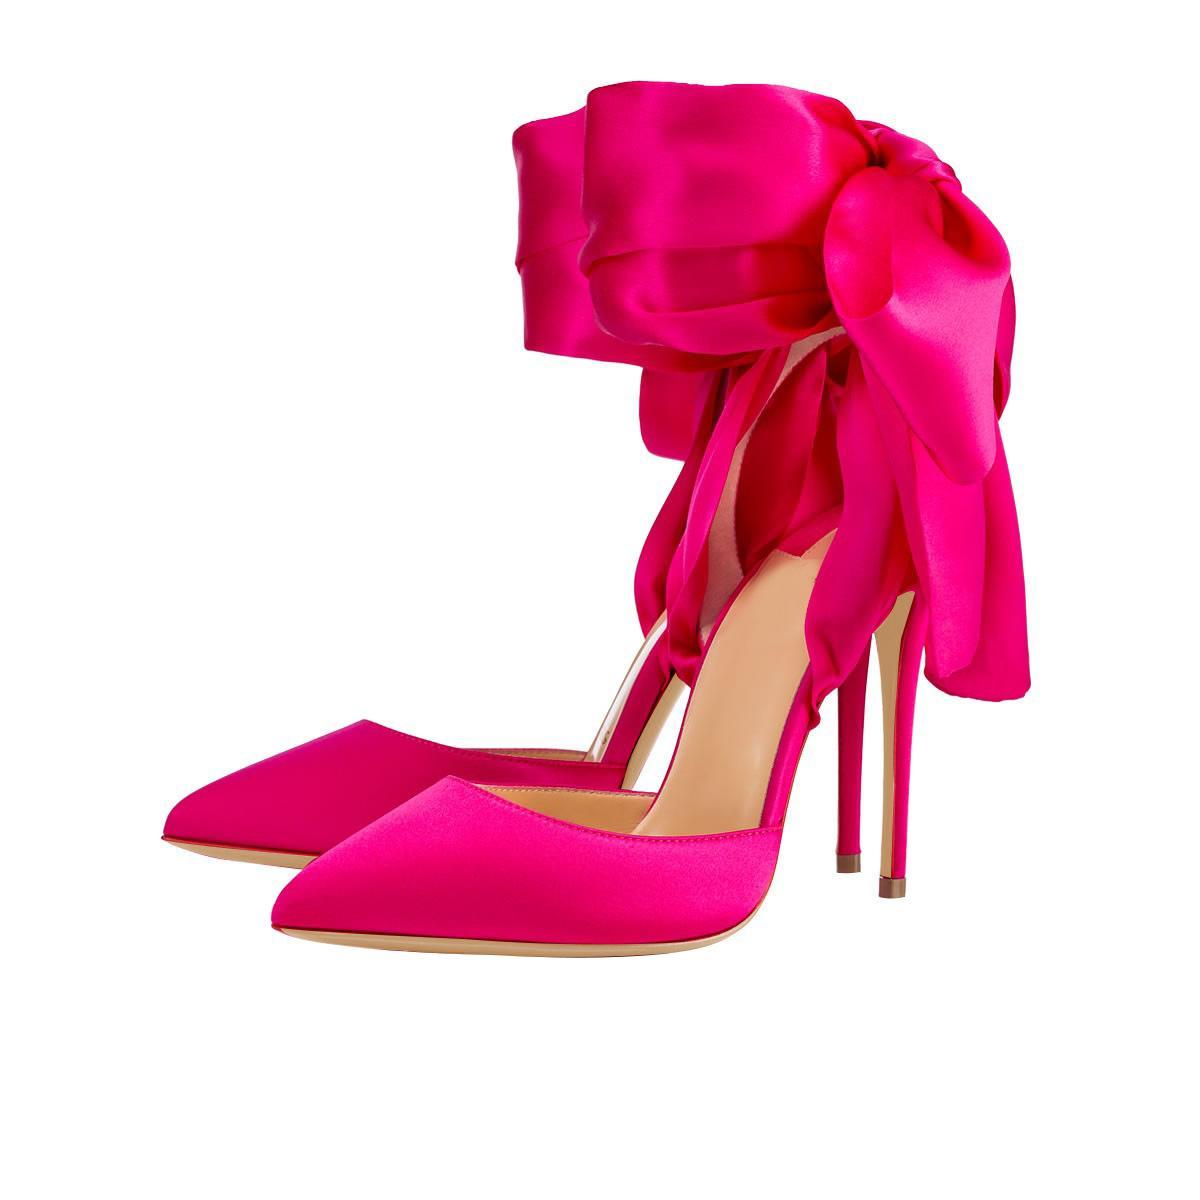 New 8.5cm 10cm 12cm pointed toe banquet pumps satin fashion bowtie red bottom high heels wedding dress shoes black fuchsia